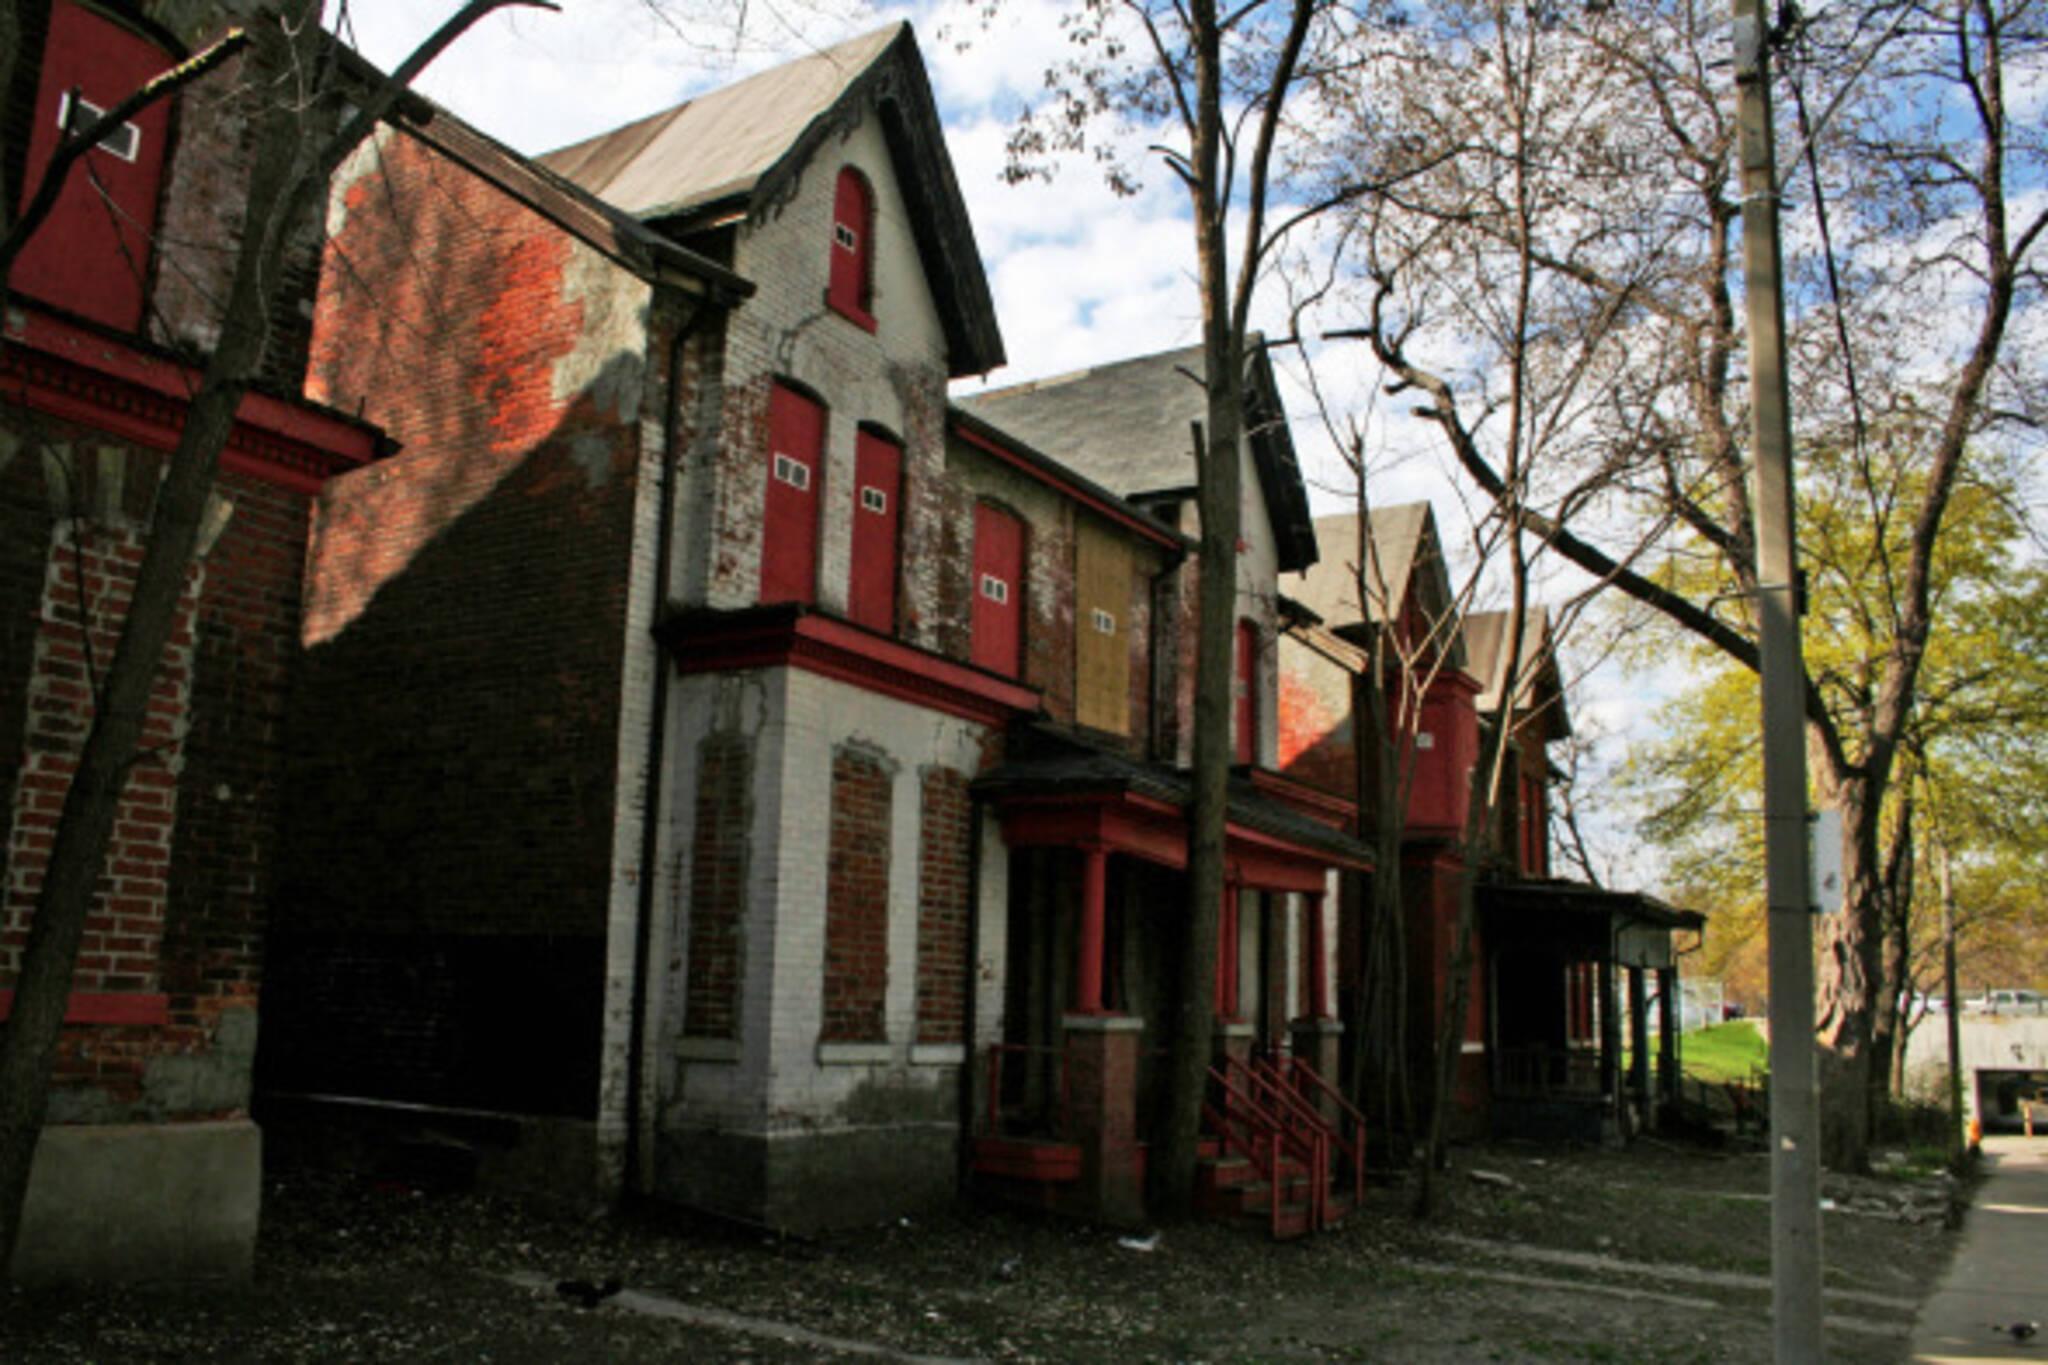 Abandoned Homes on Glen Road